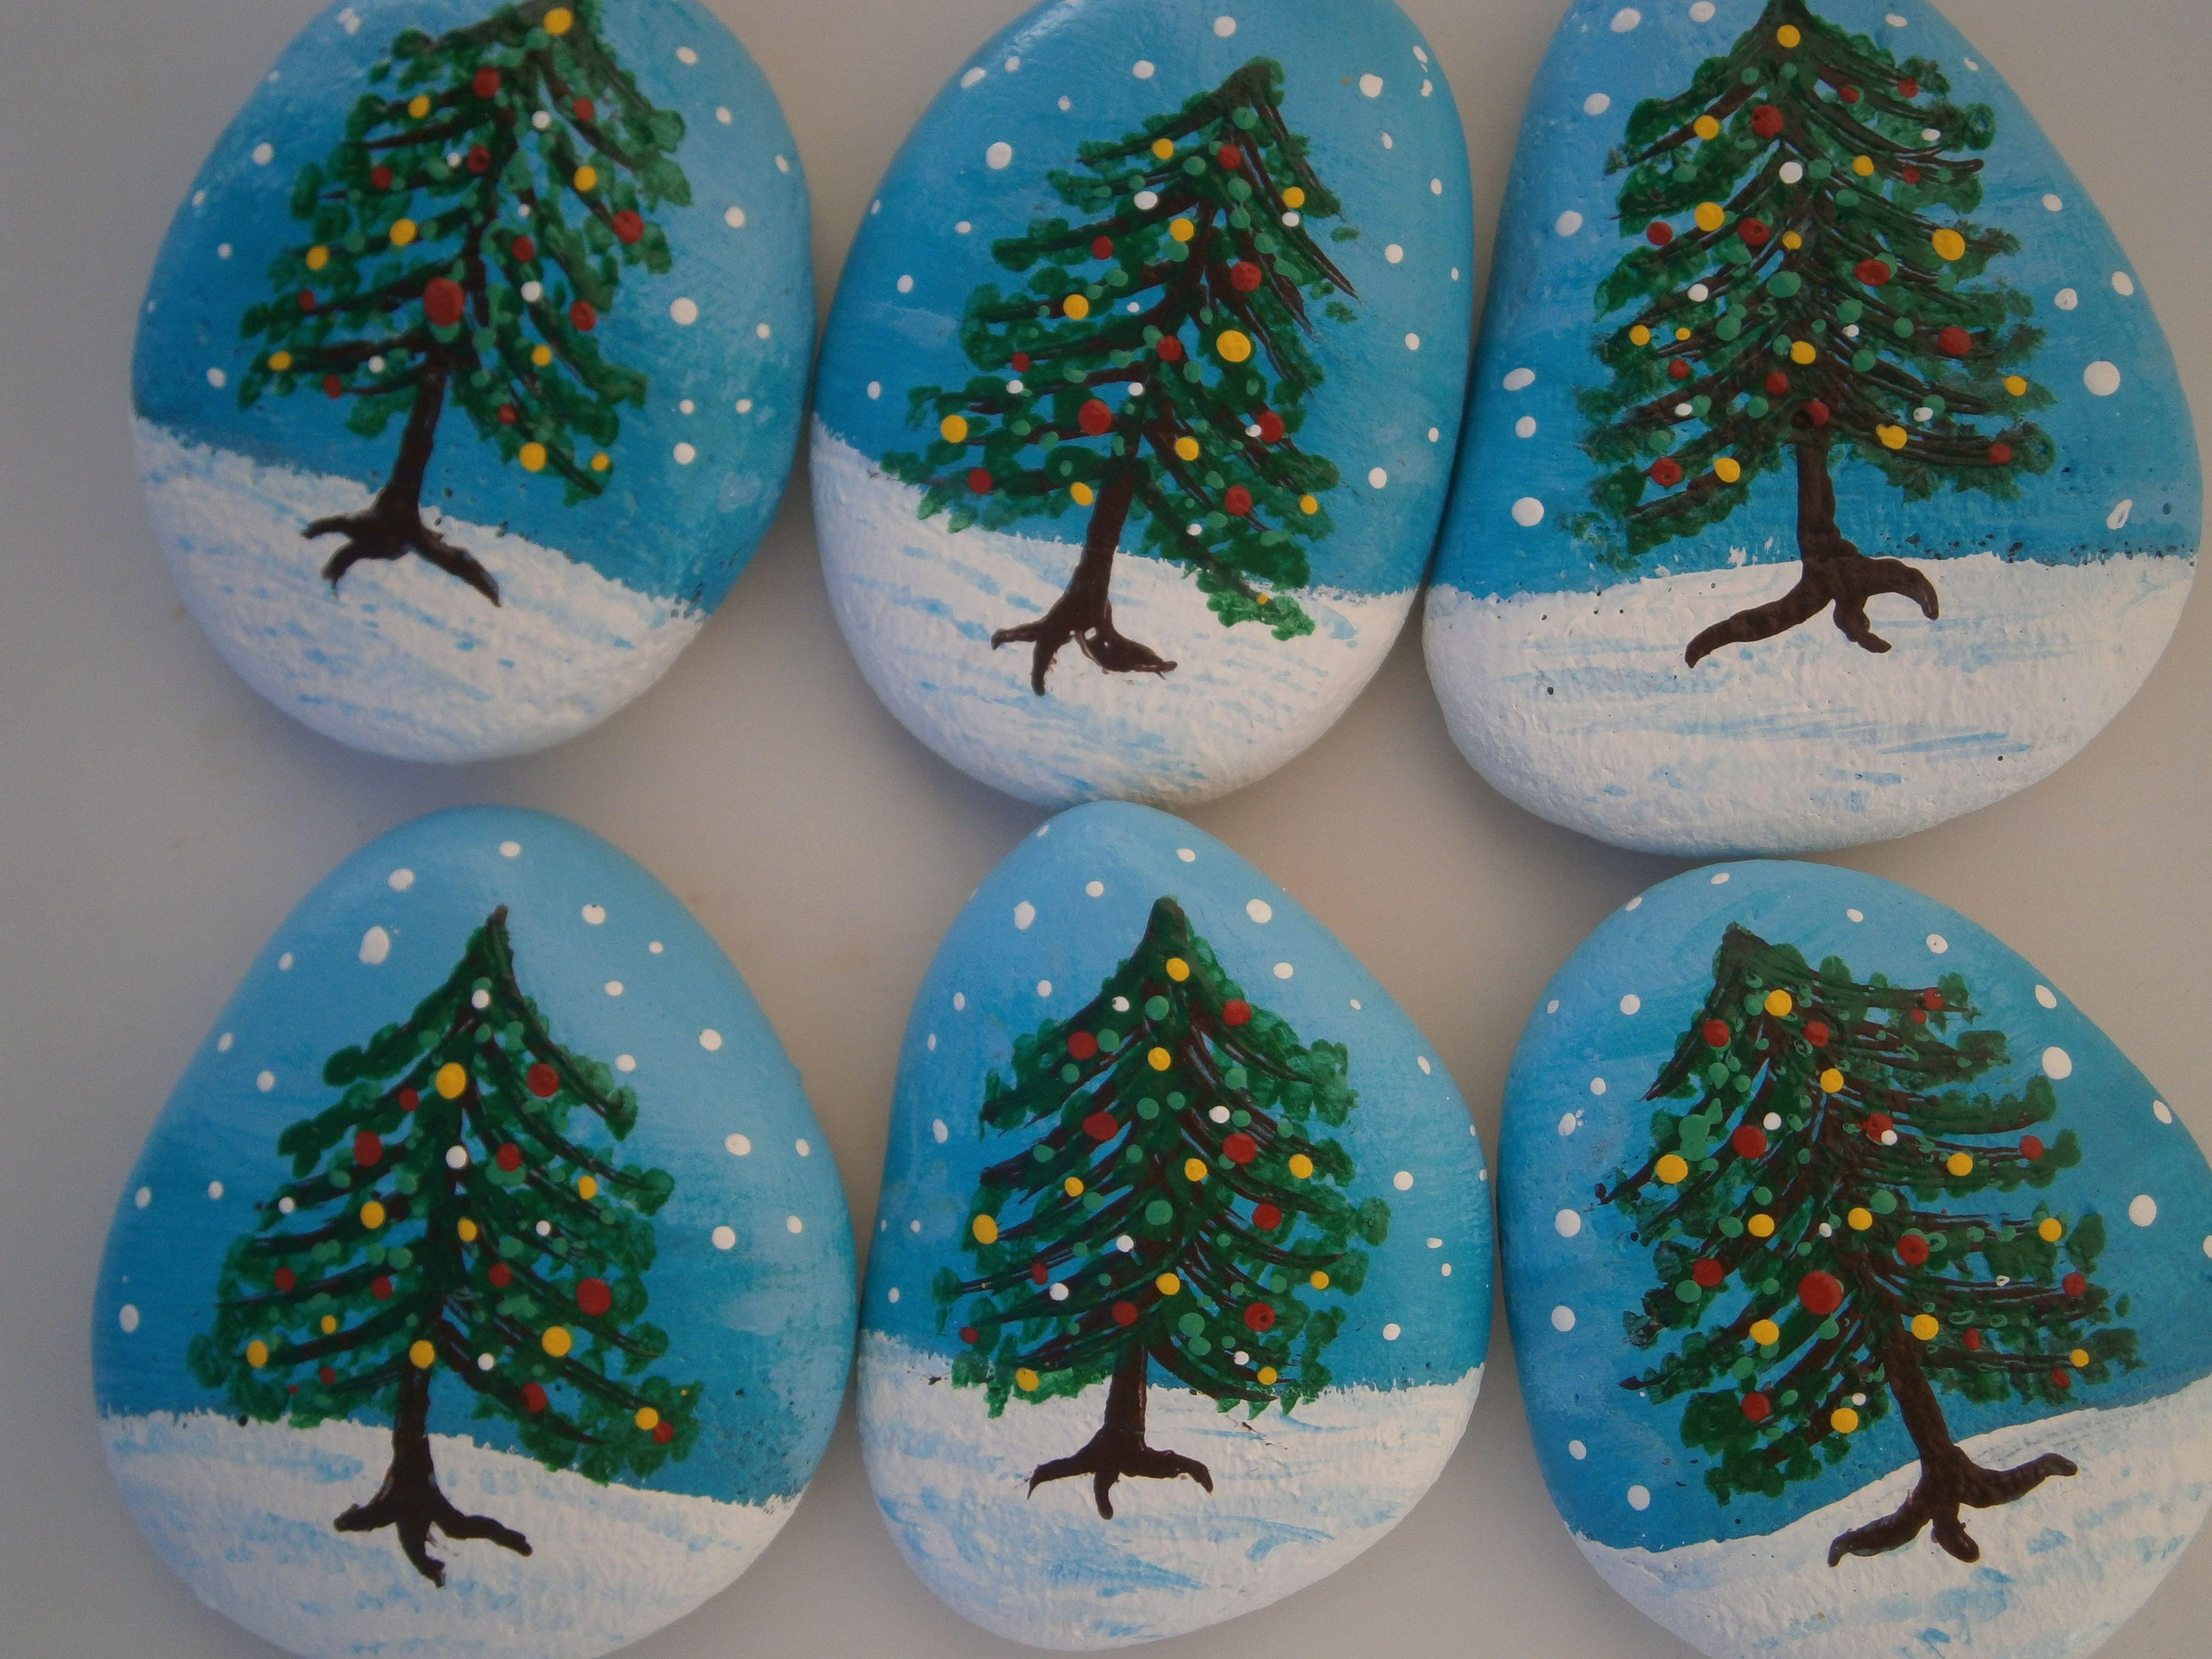 Christmas Trees Painted Rocks at